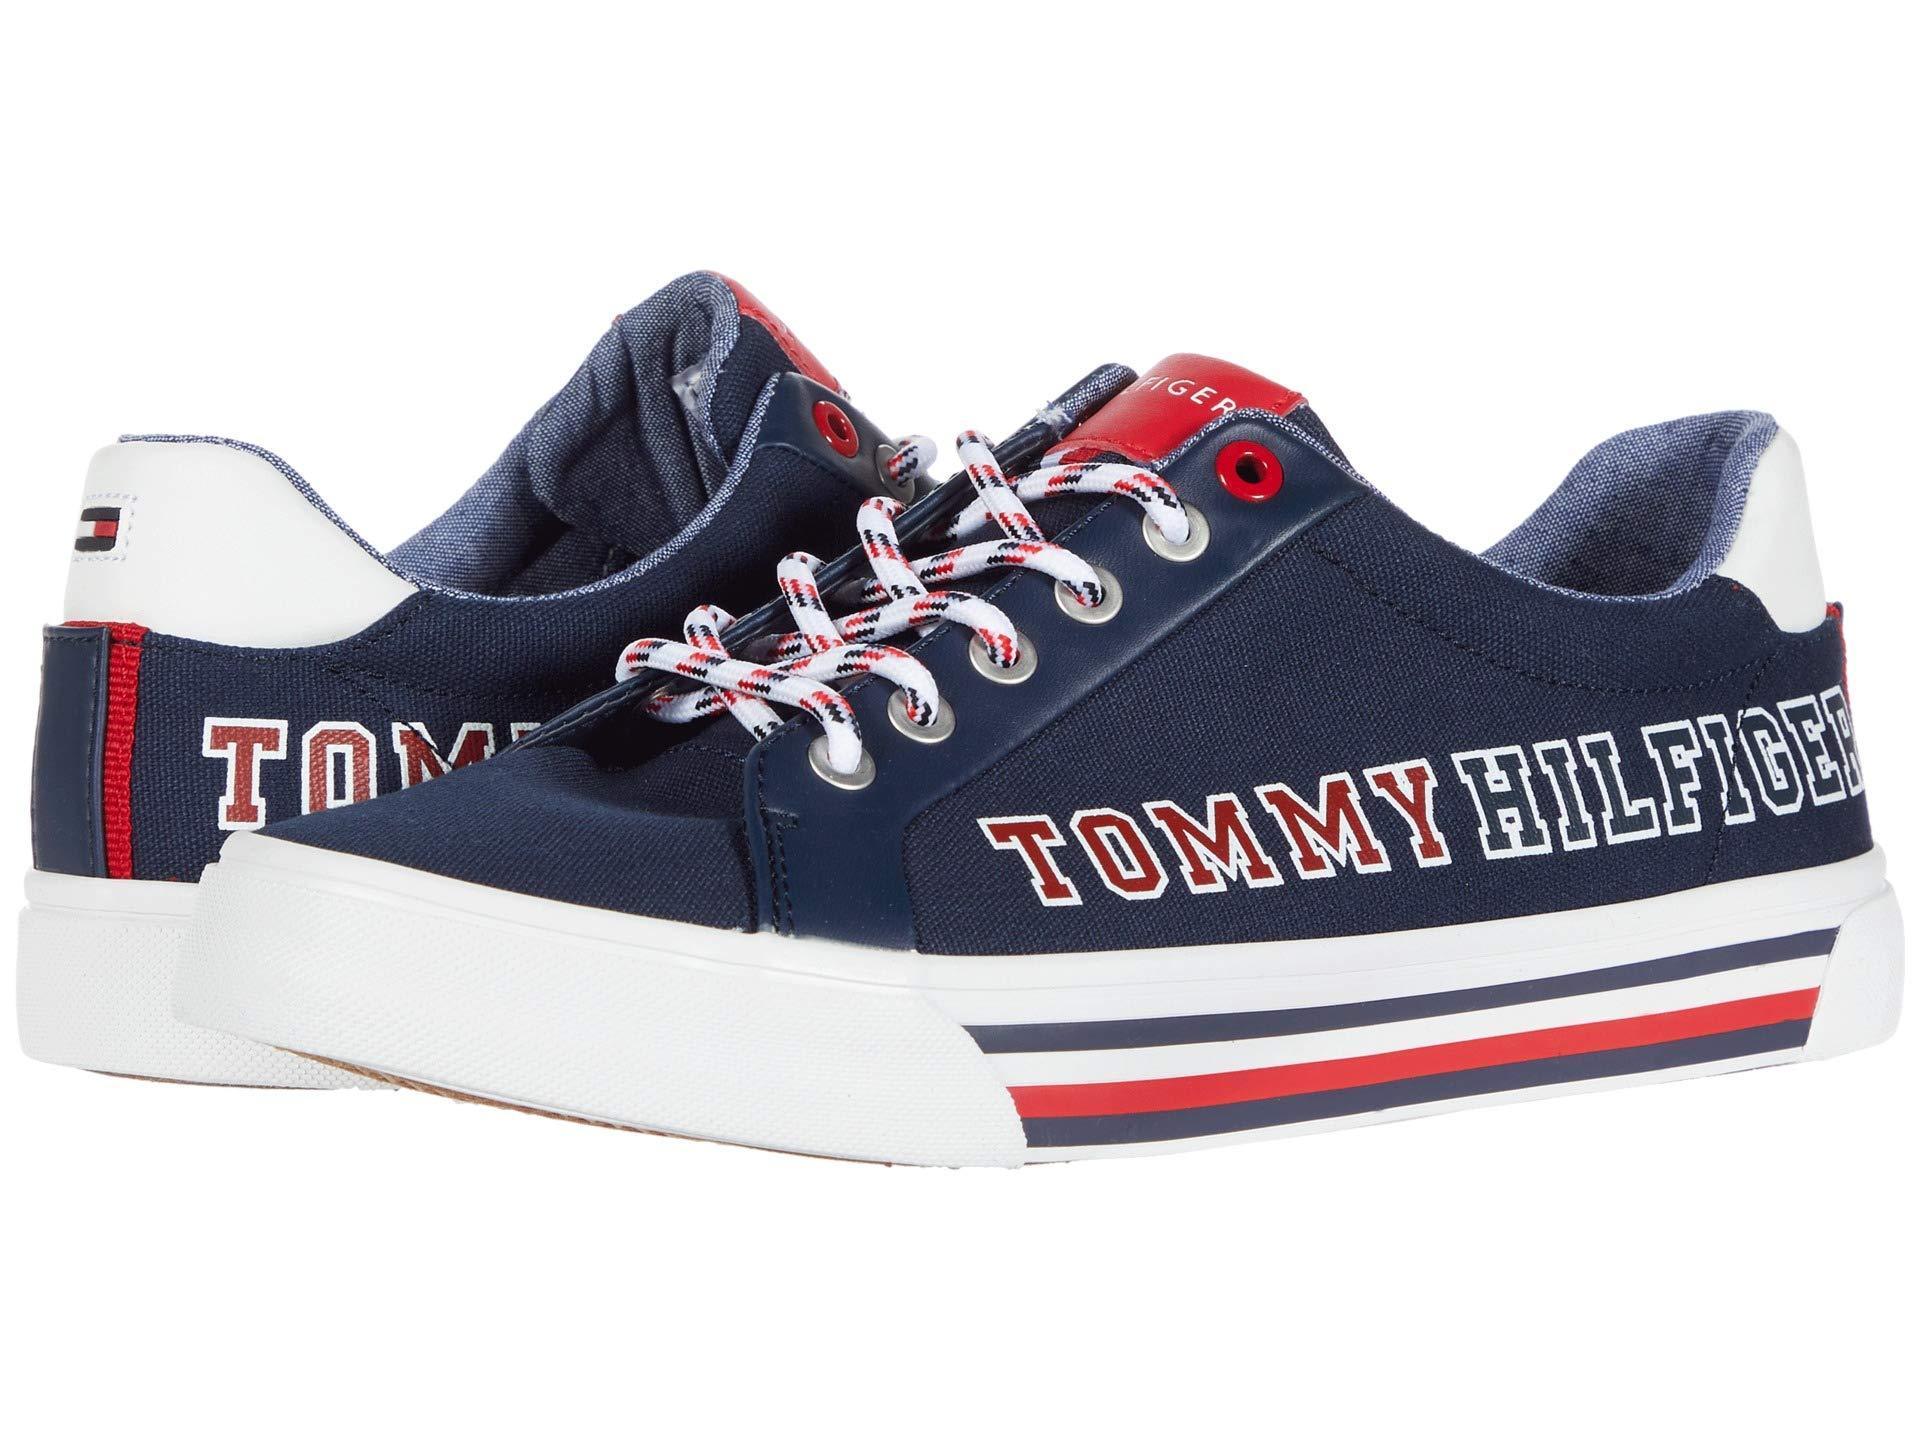 Tommy Hilfiger Tommy Hilfiger Randian